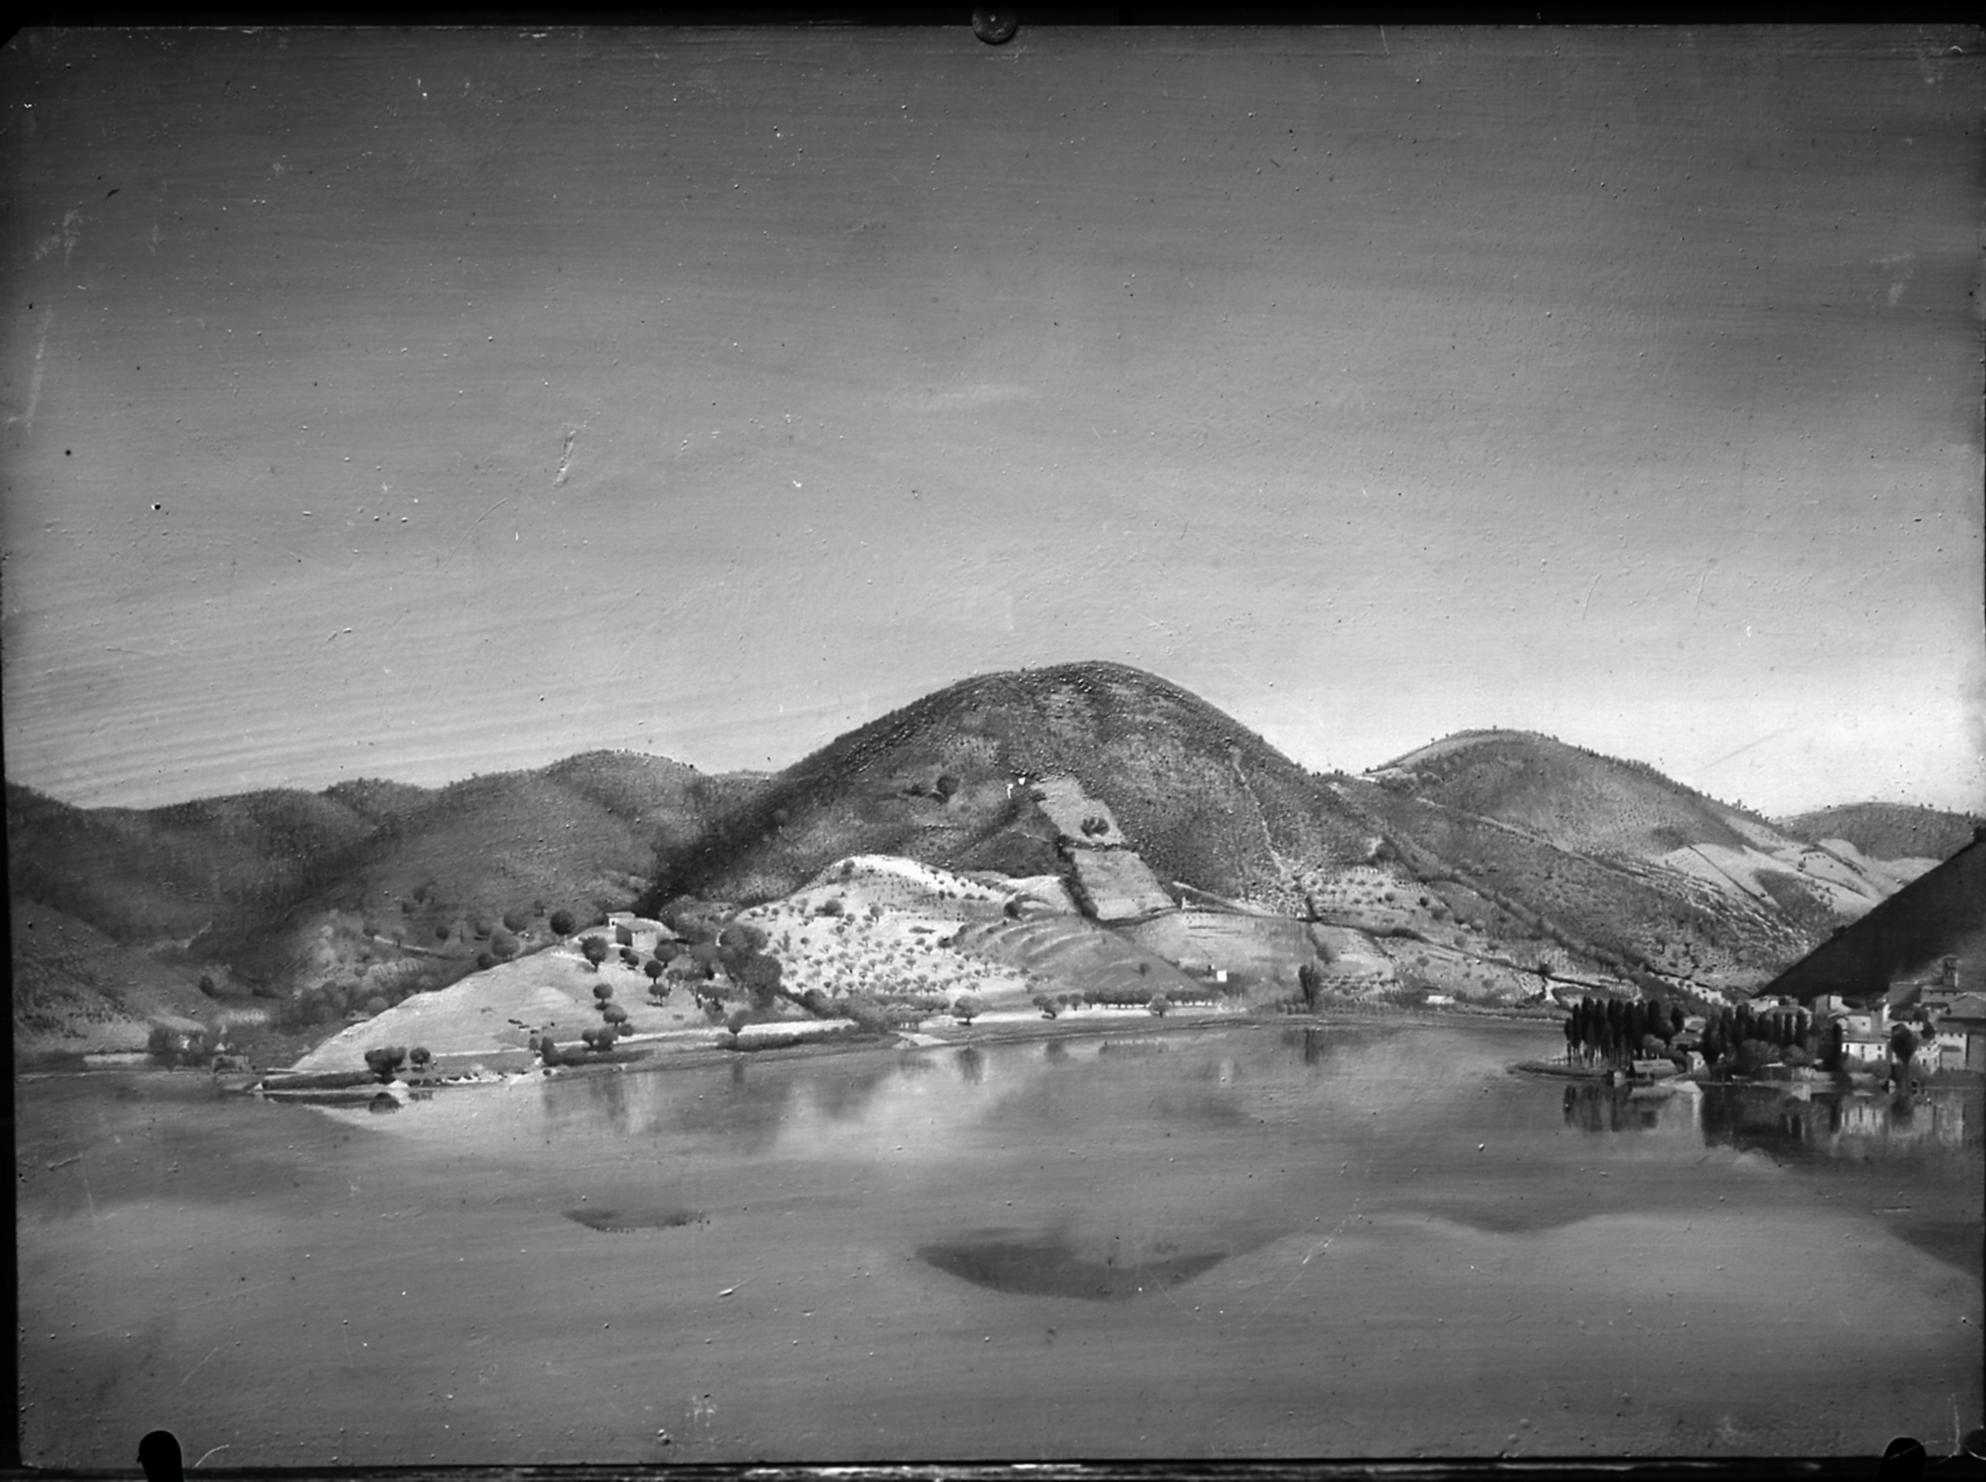 Photograph of Piediluco by Tom Monnington, (c. 1925). BSR Fine Arts Archive